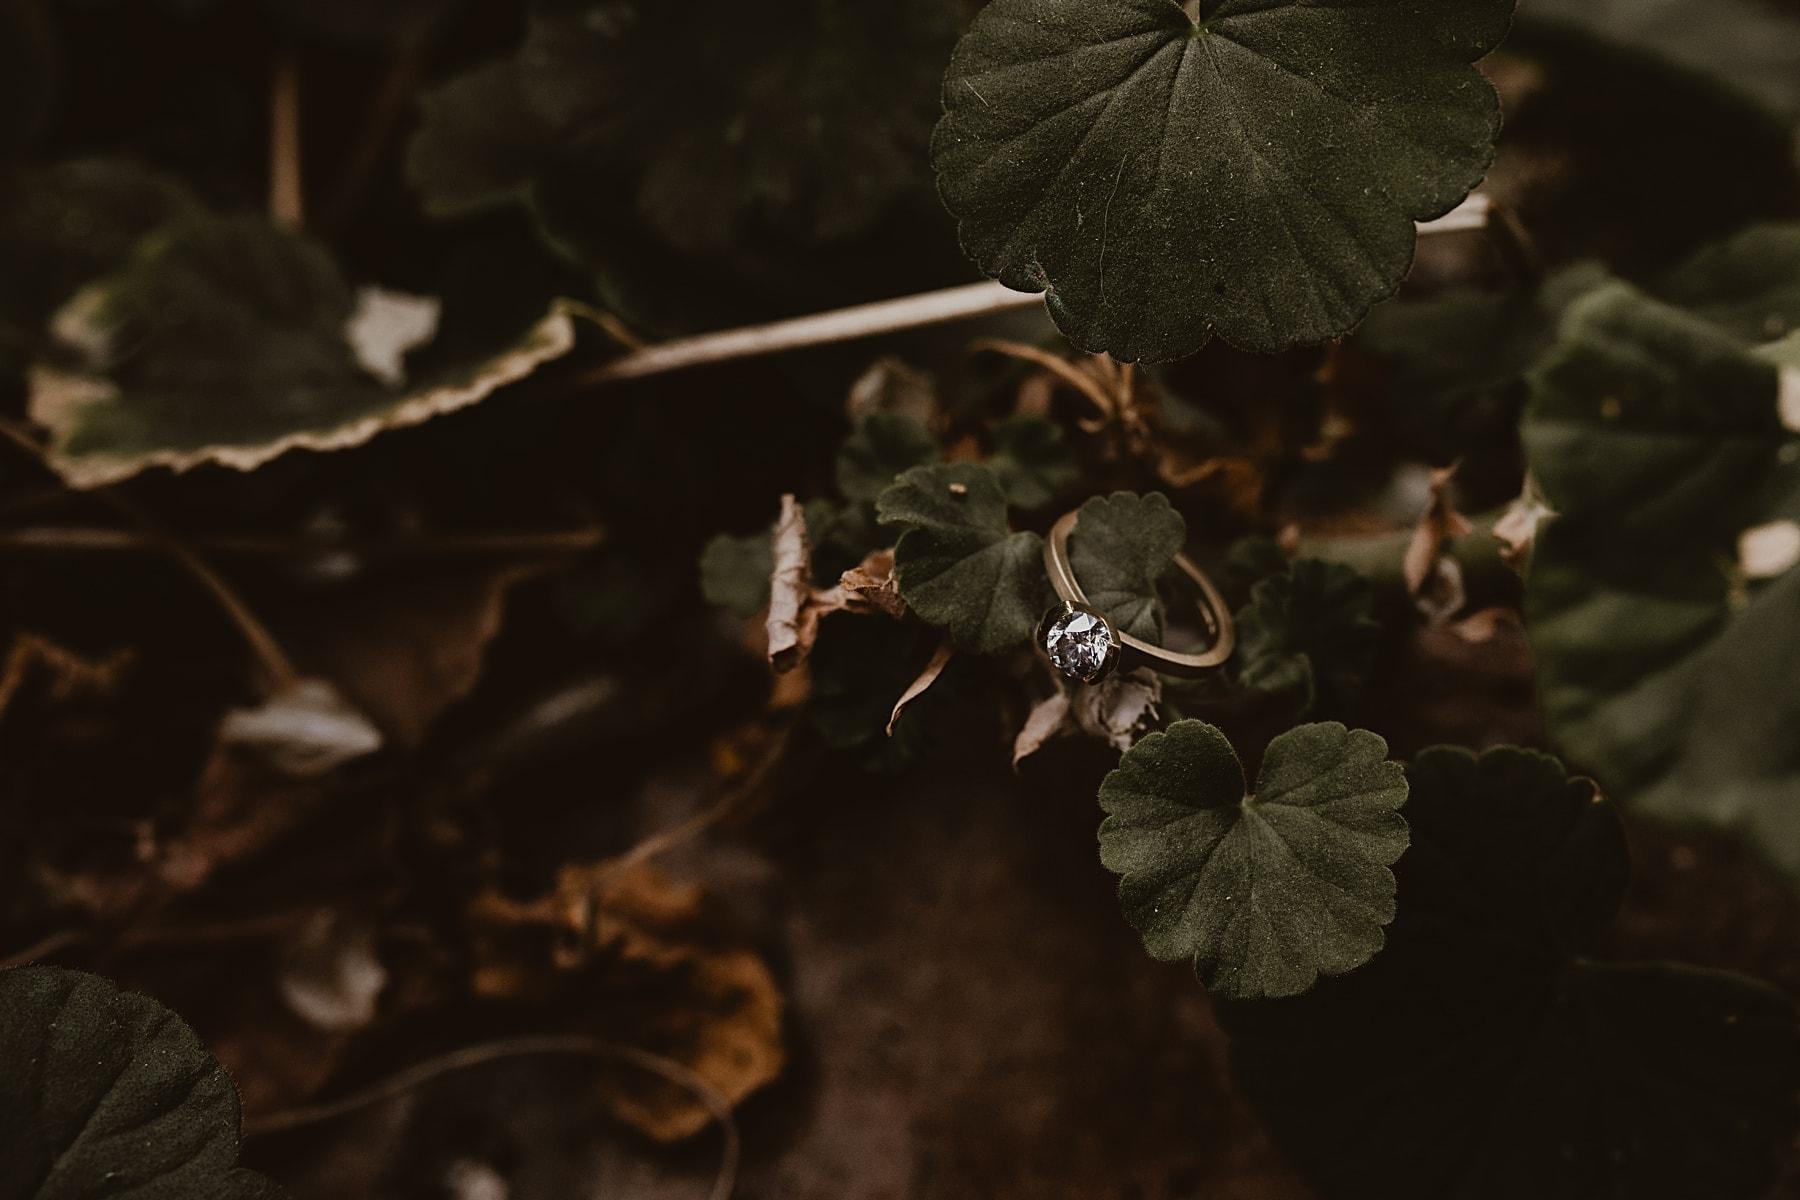 Wedding ring in foliage